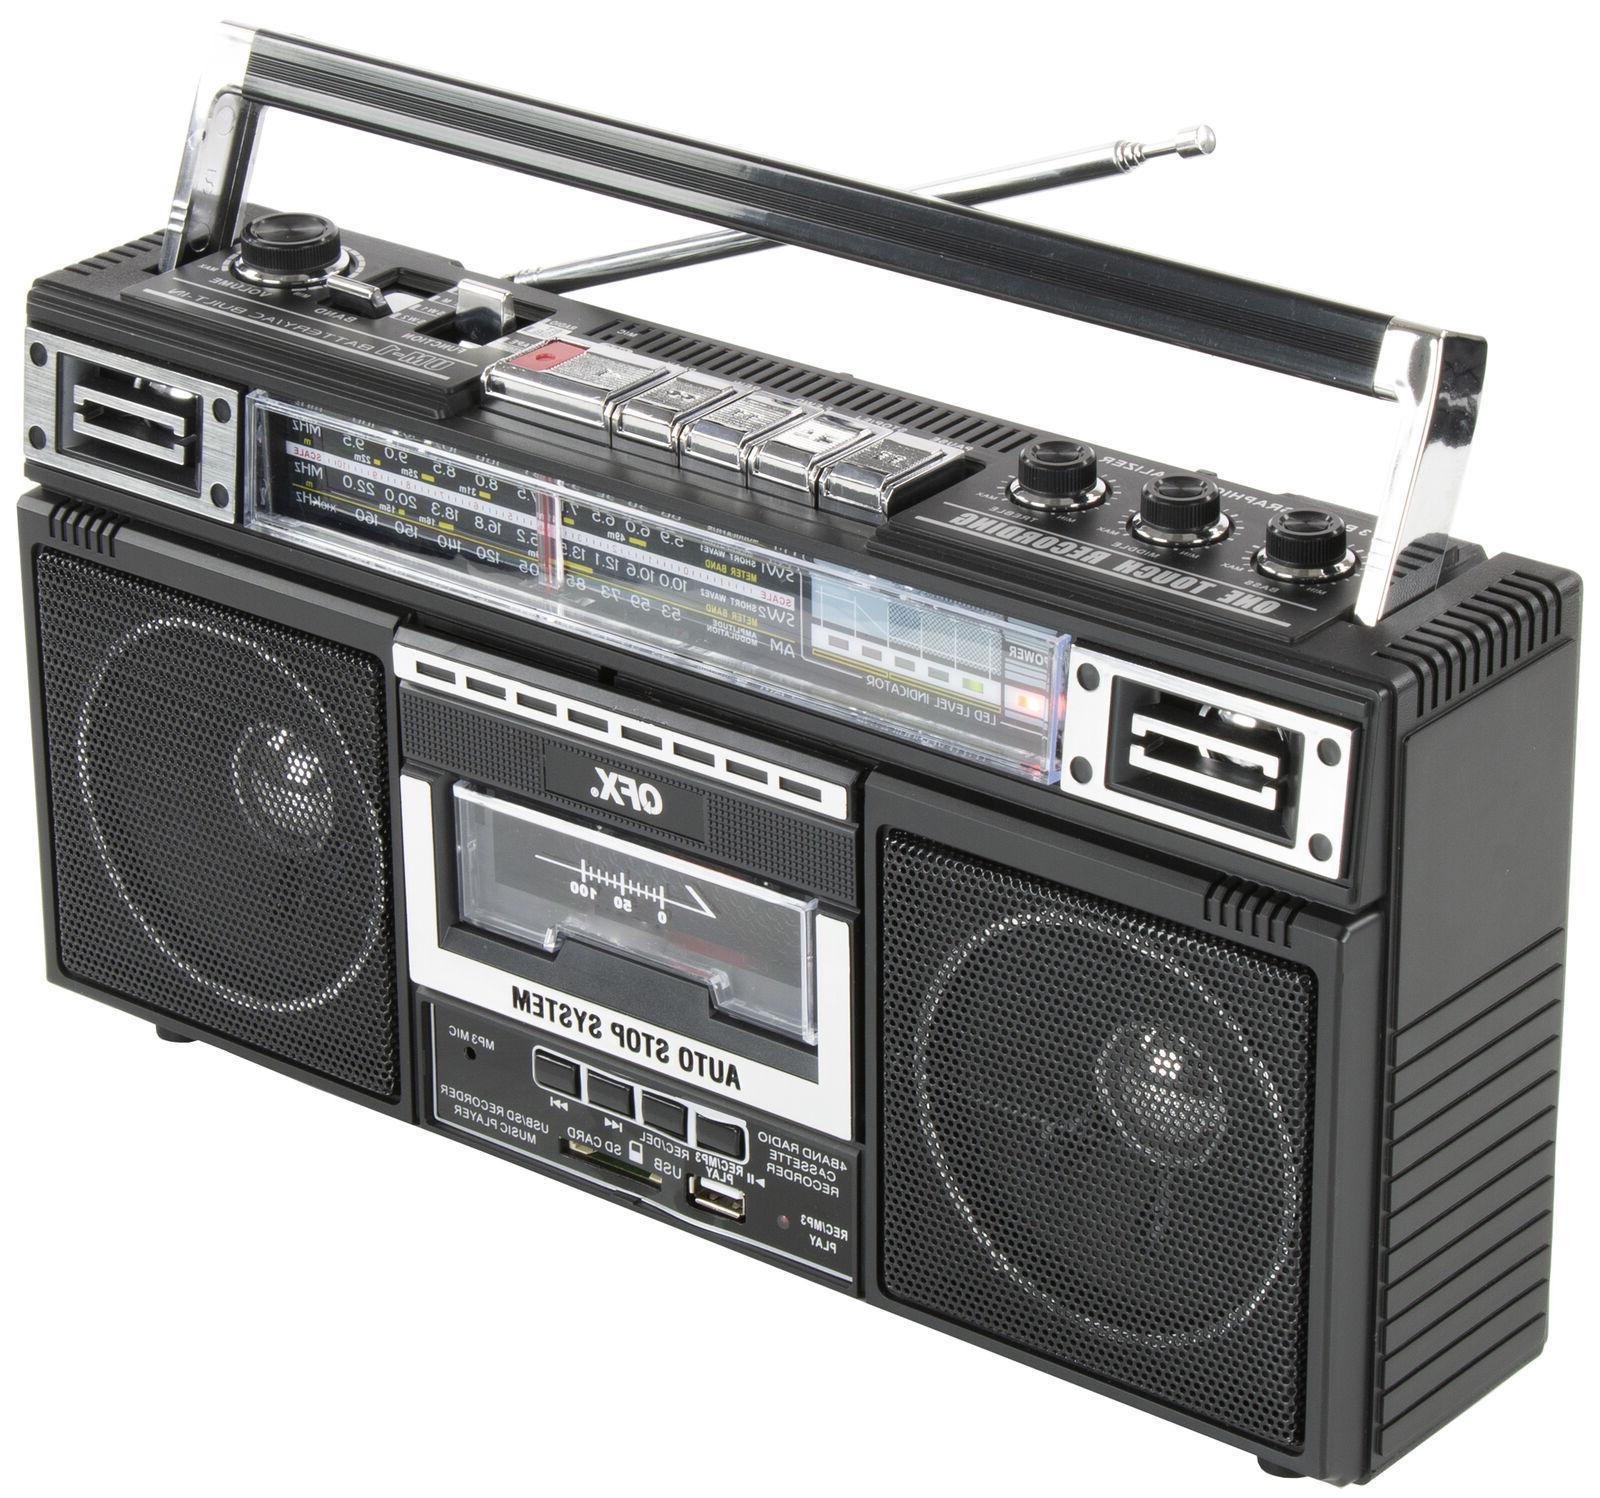 Cassette Player Recorder Converter Boombox